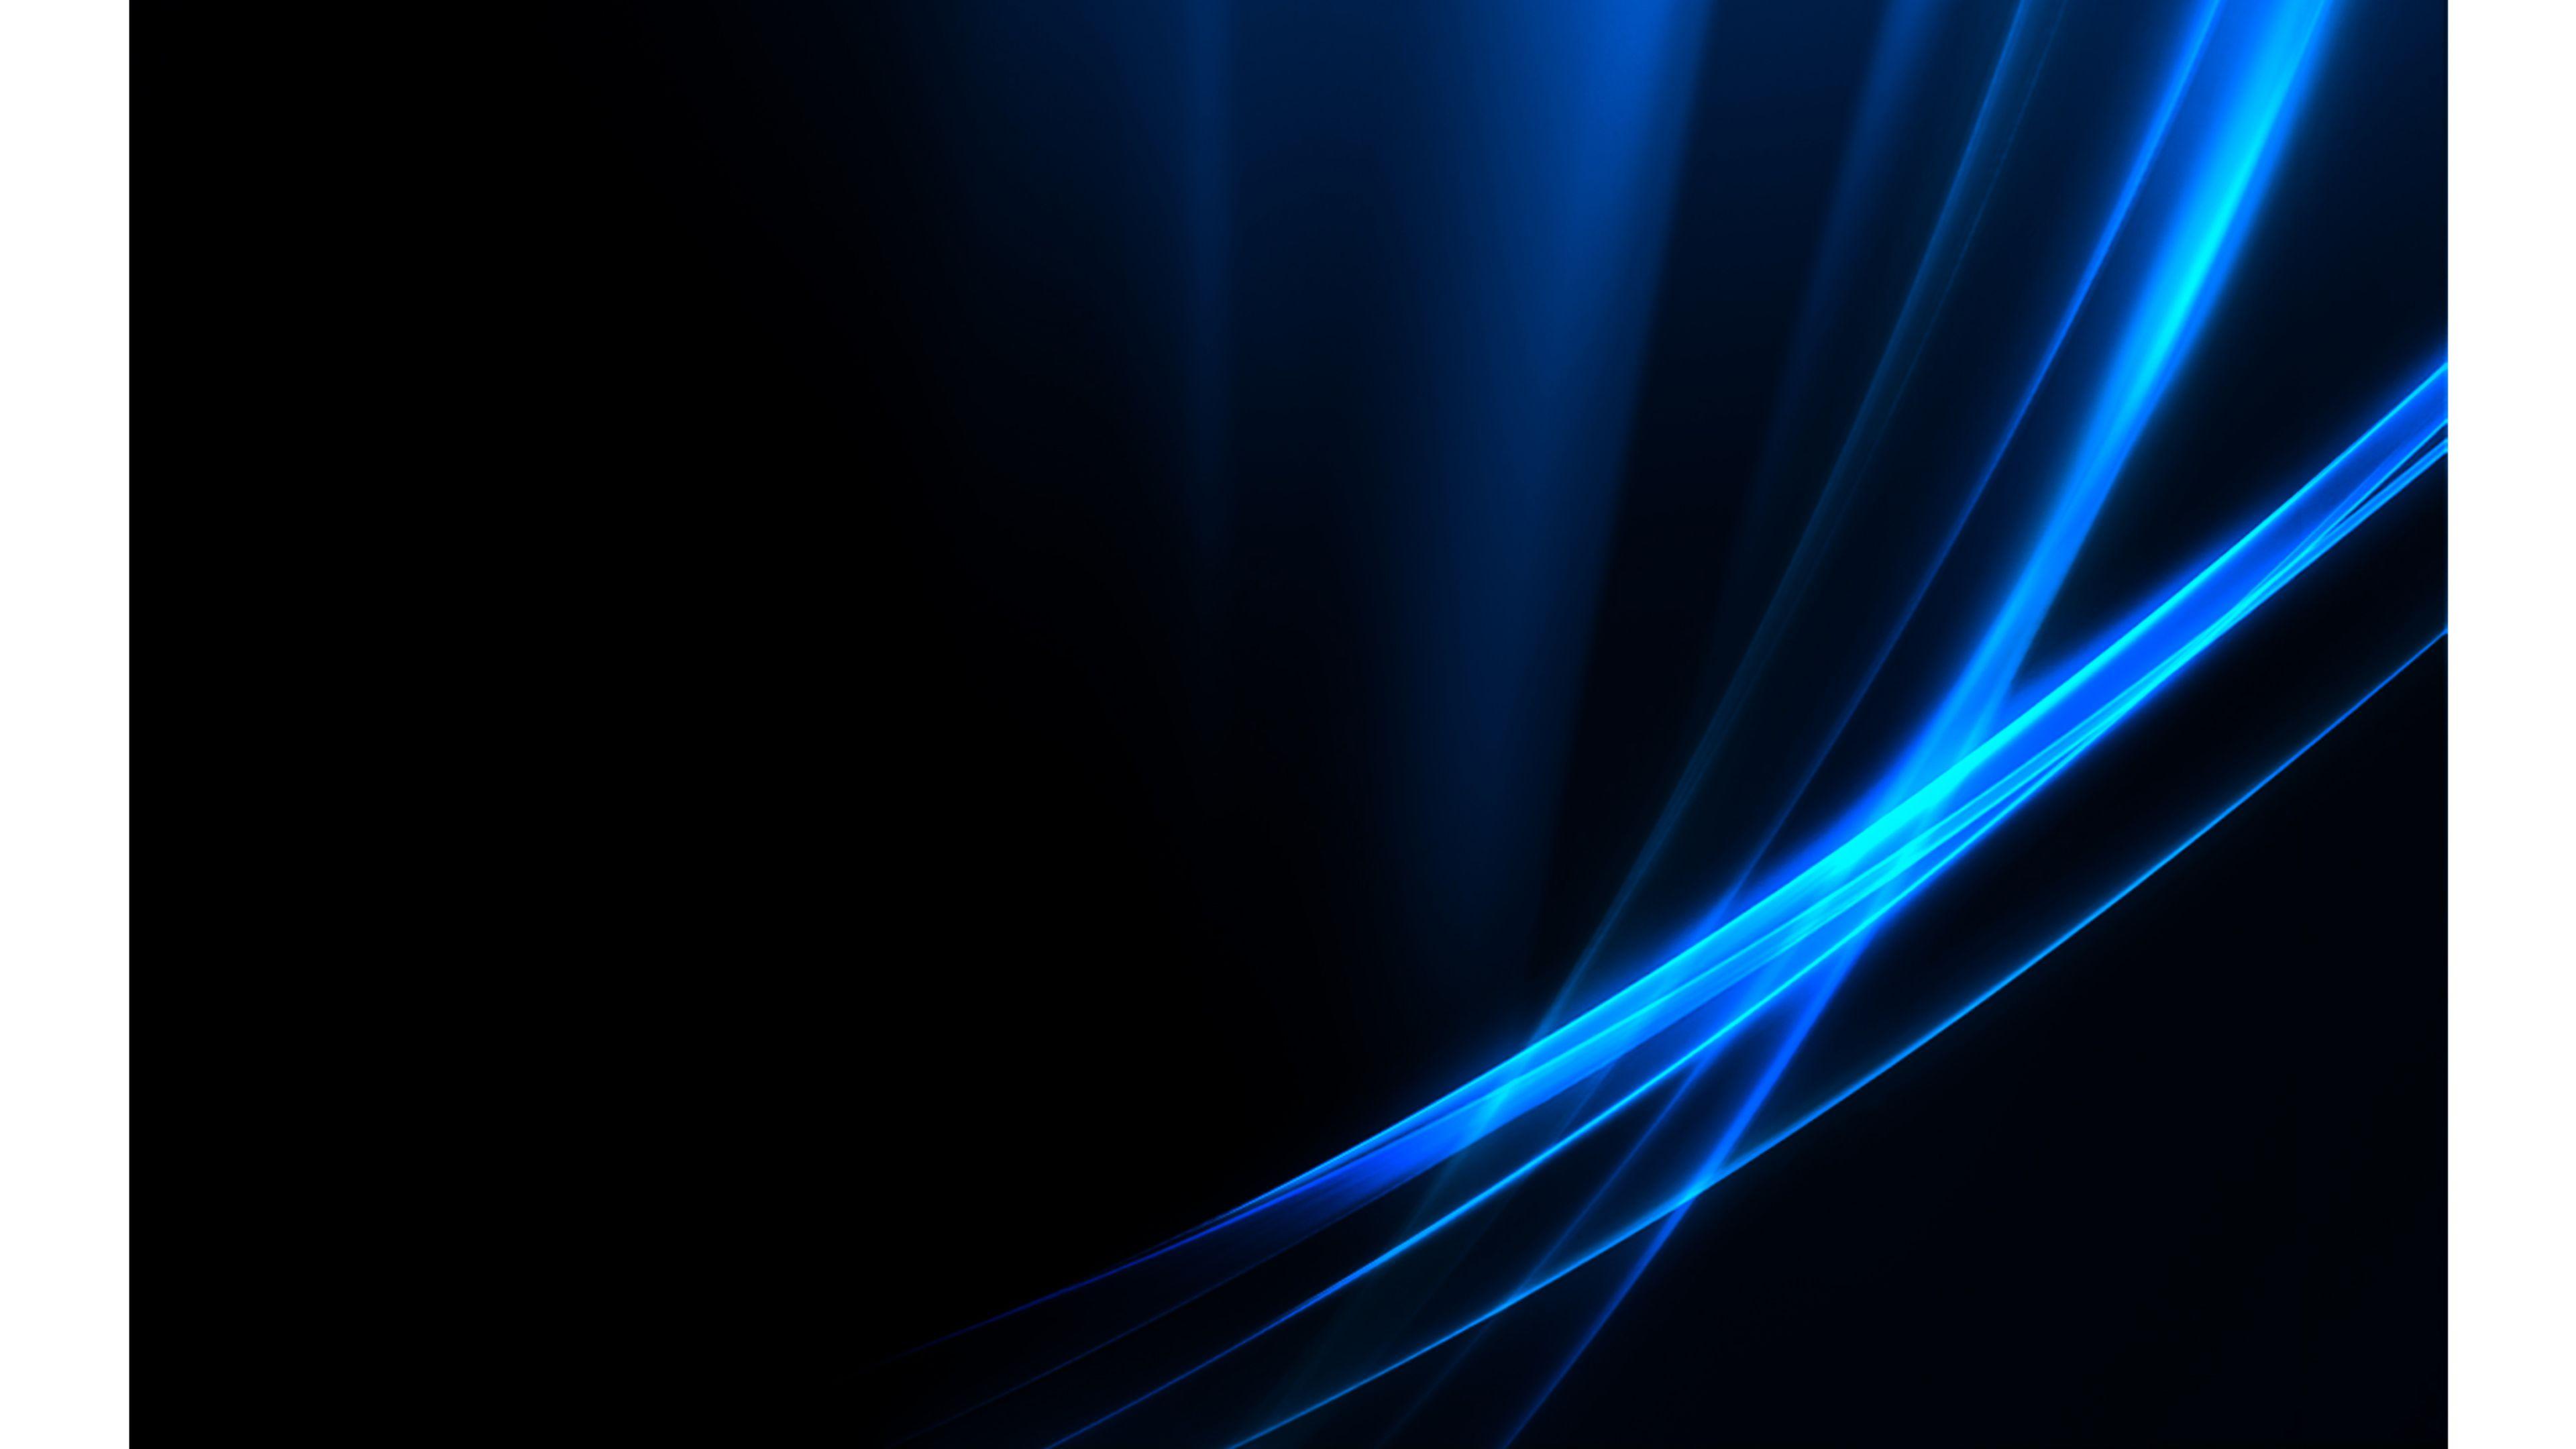 Neon Blue Background - WallpaperSafari